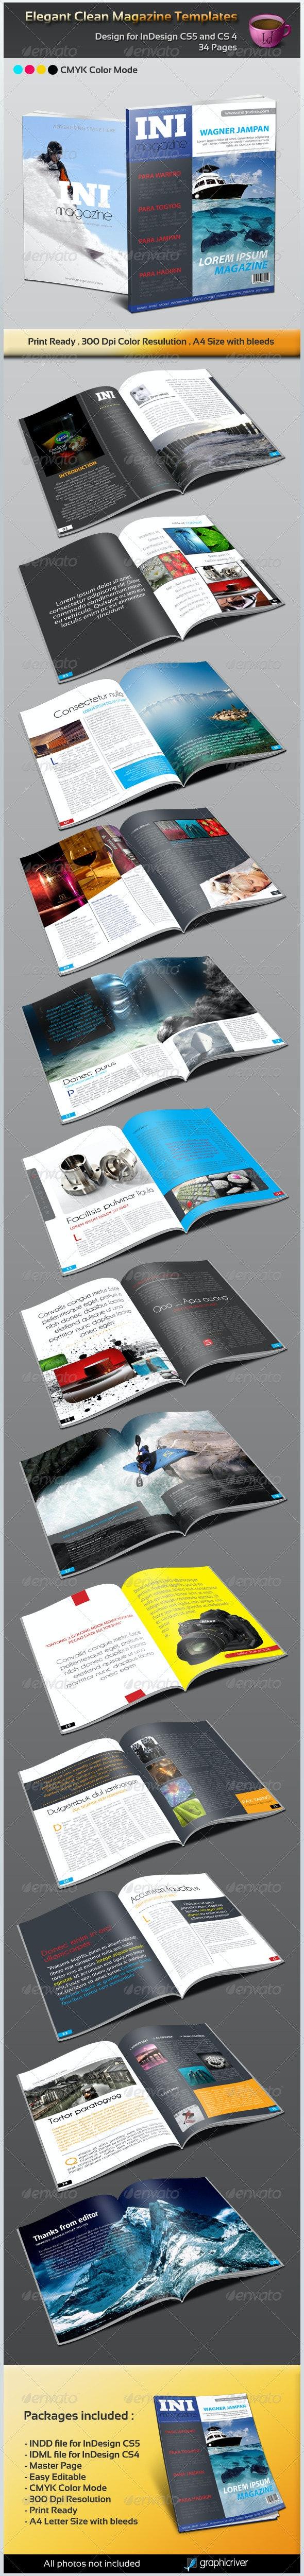 Elegant Clean Magazine Template - Magazines Print Templates